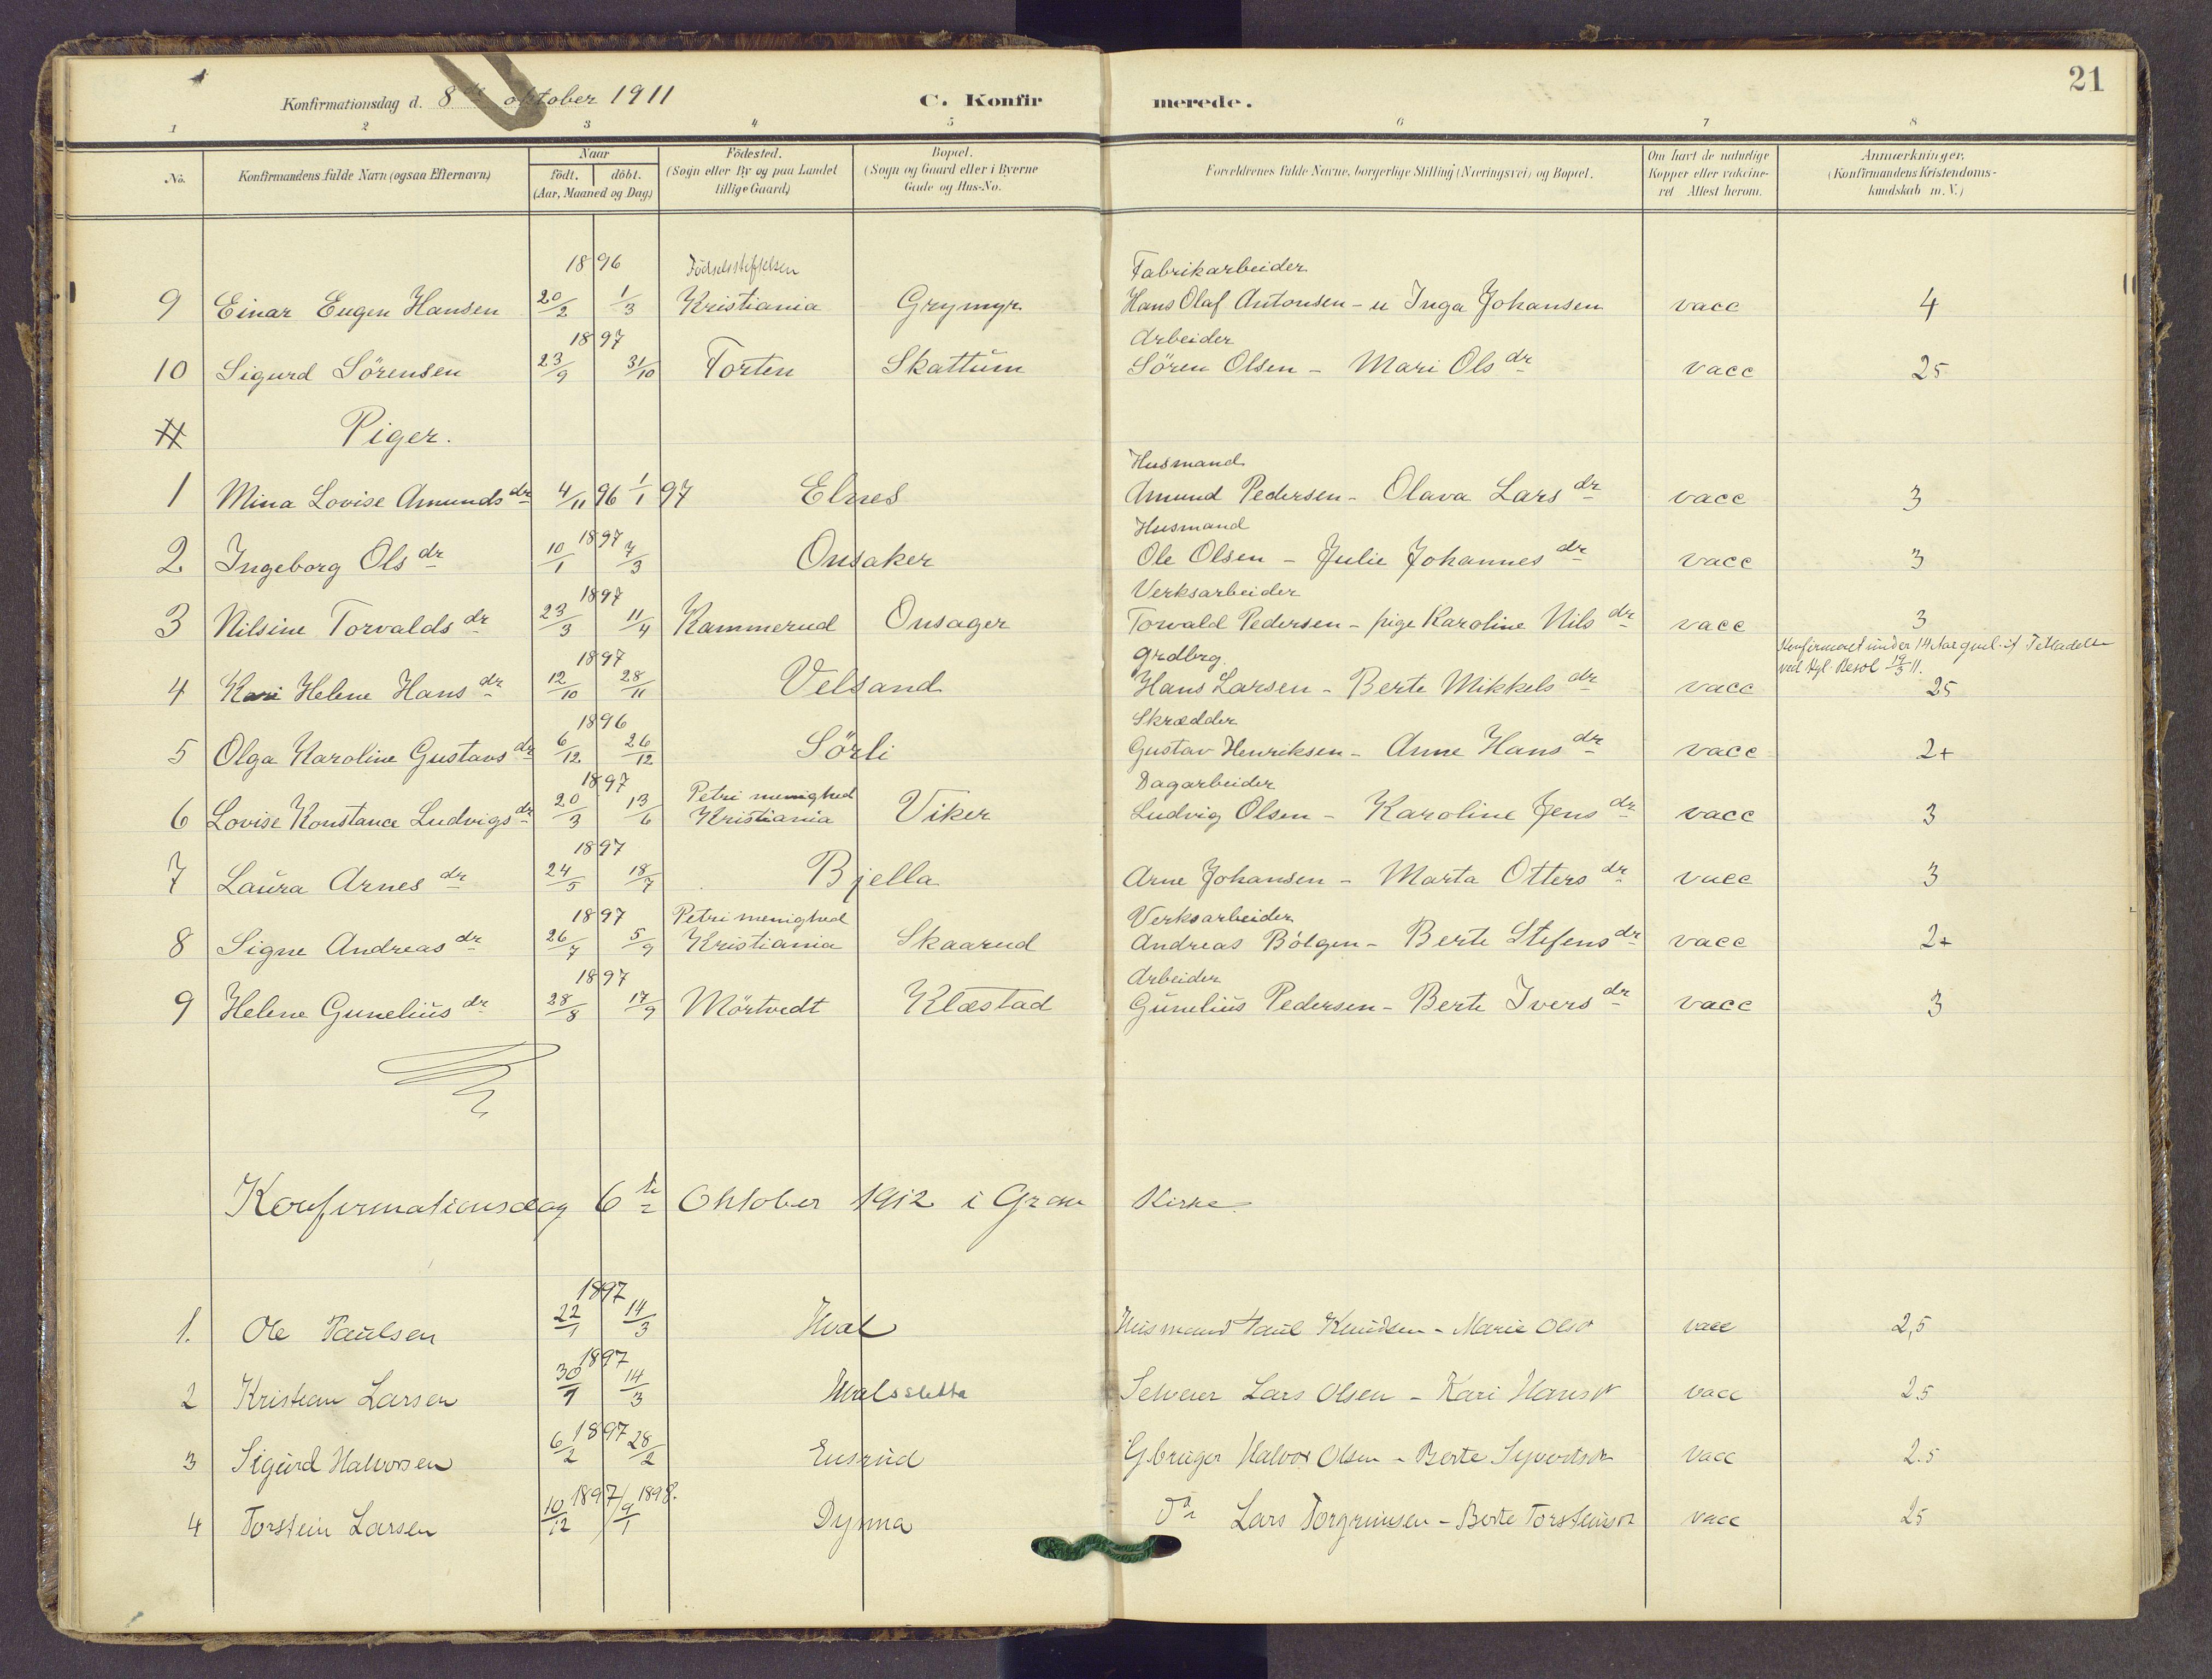 SAH, Gran prestekontor, Ministerialbok nr. 22, 1908-1918, s. 21